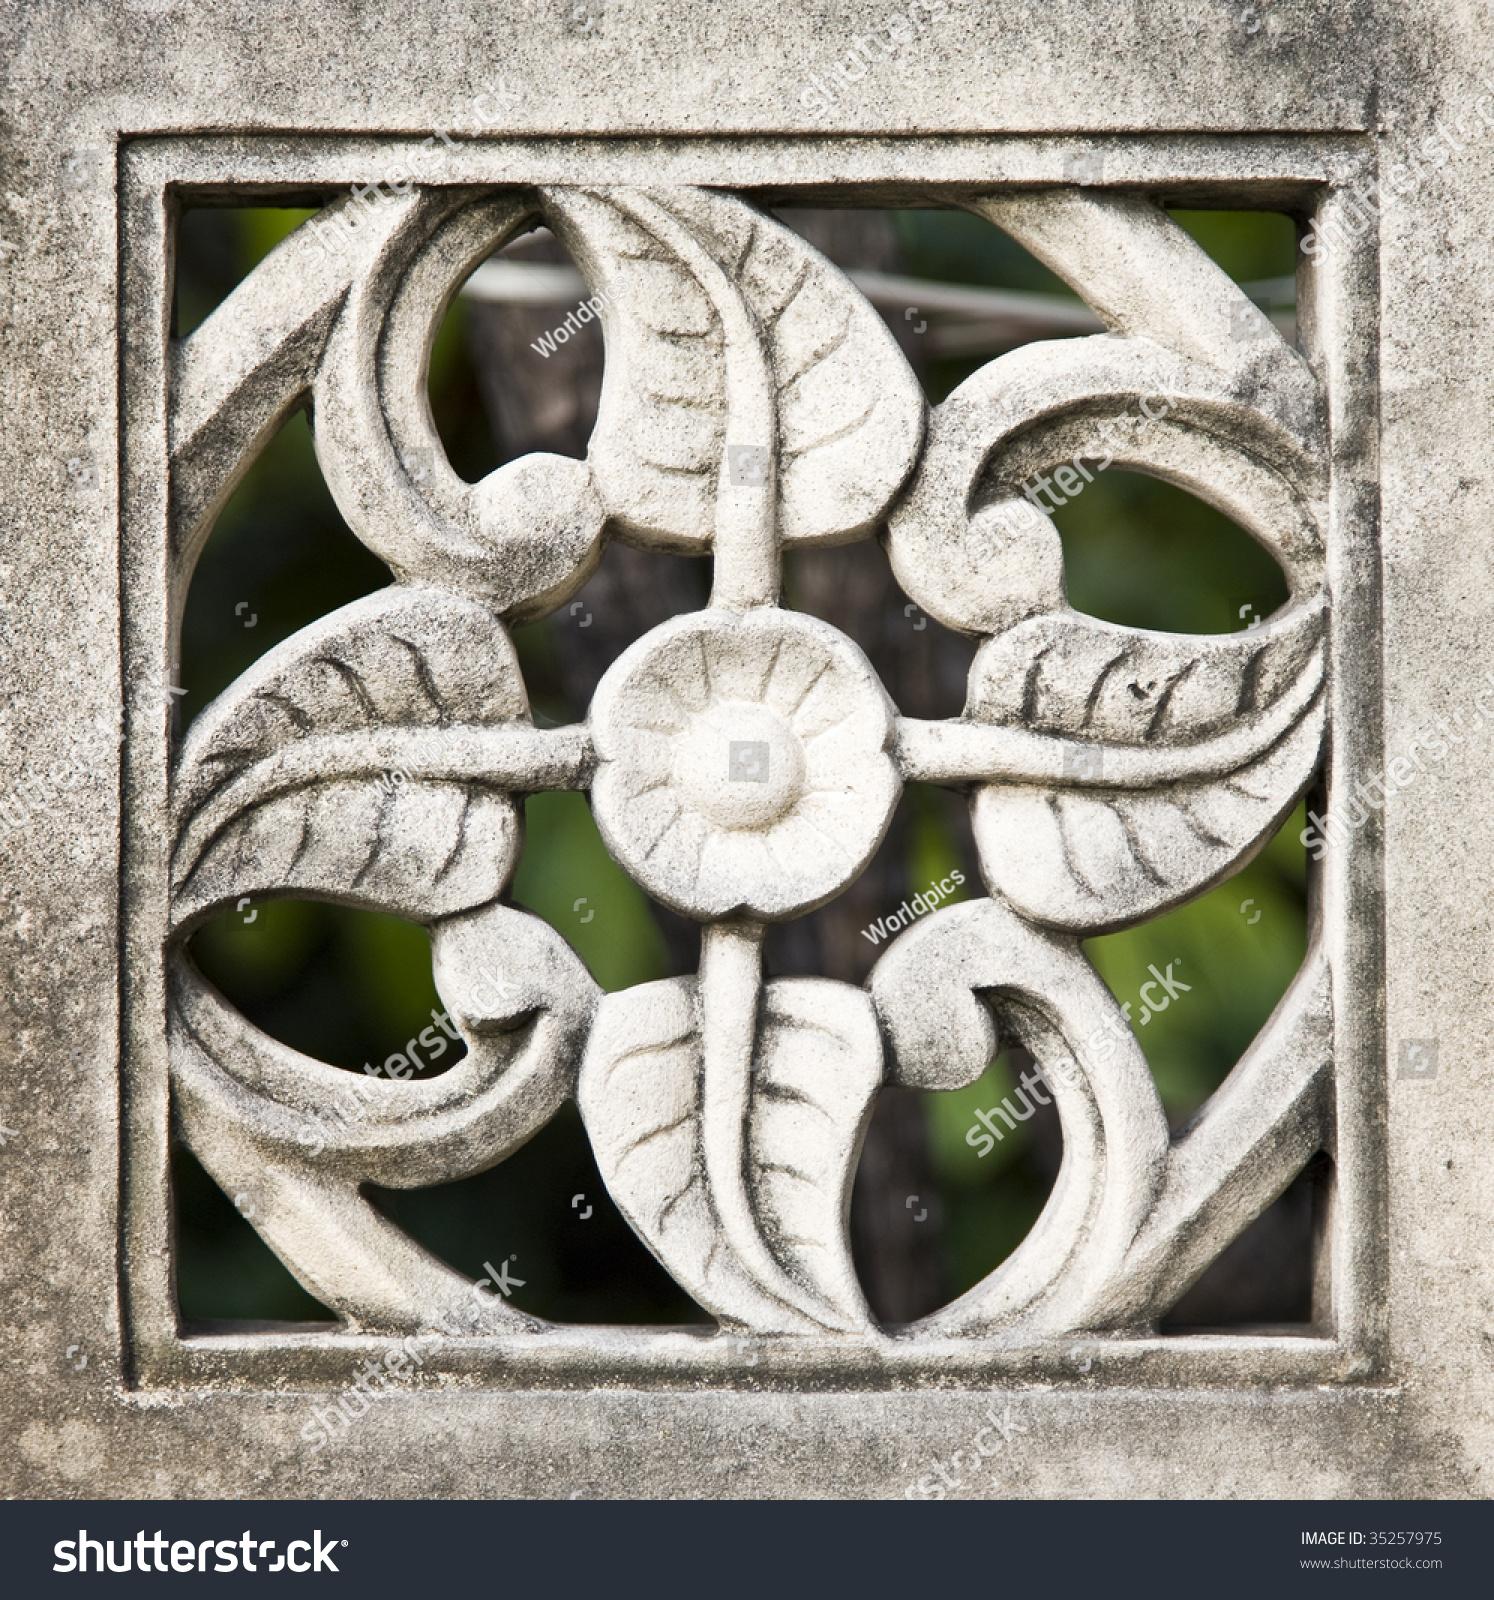 Bali stone carving stock photo shutterstock